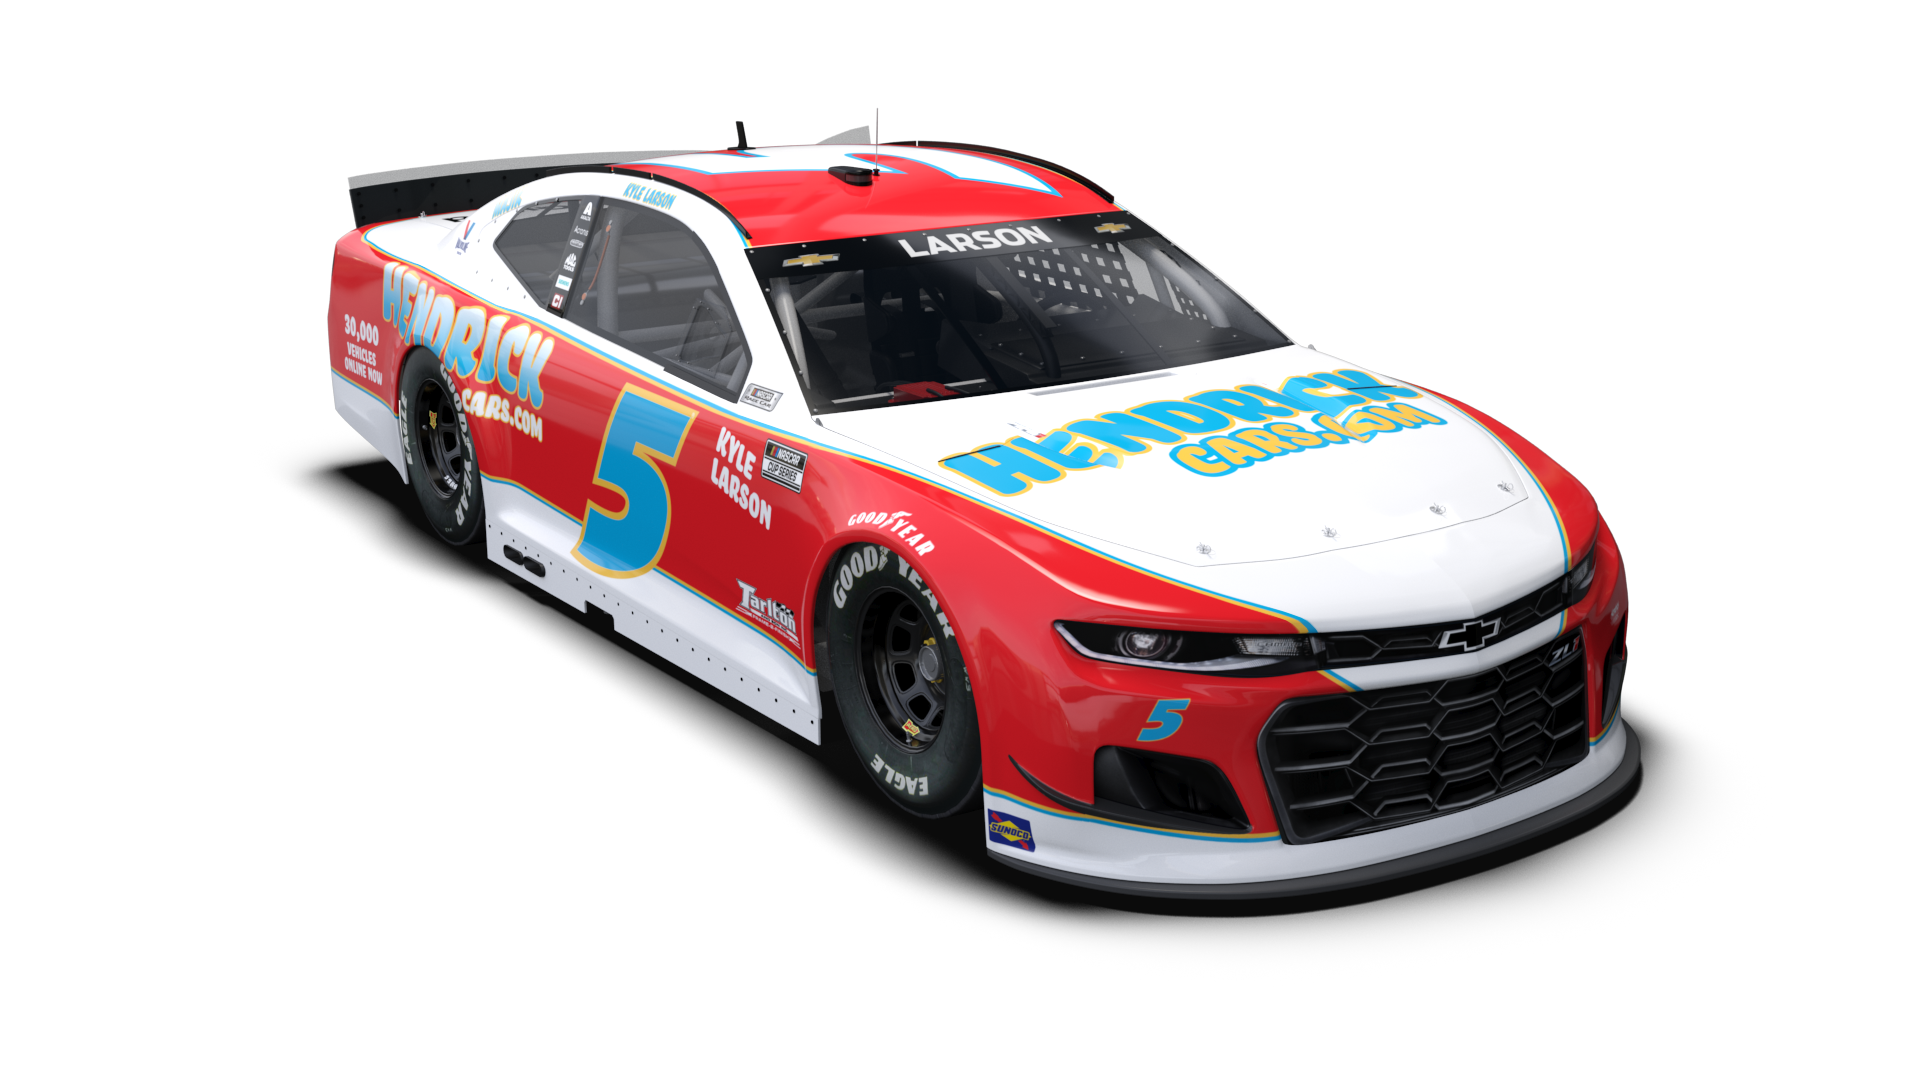 NASCAR Throwback Car - Kyle Larson - 2021 Darlington Raceway throwback